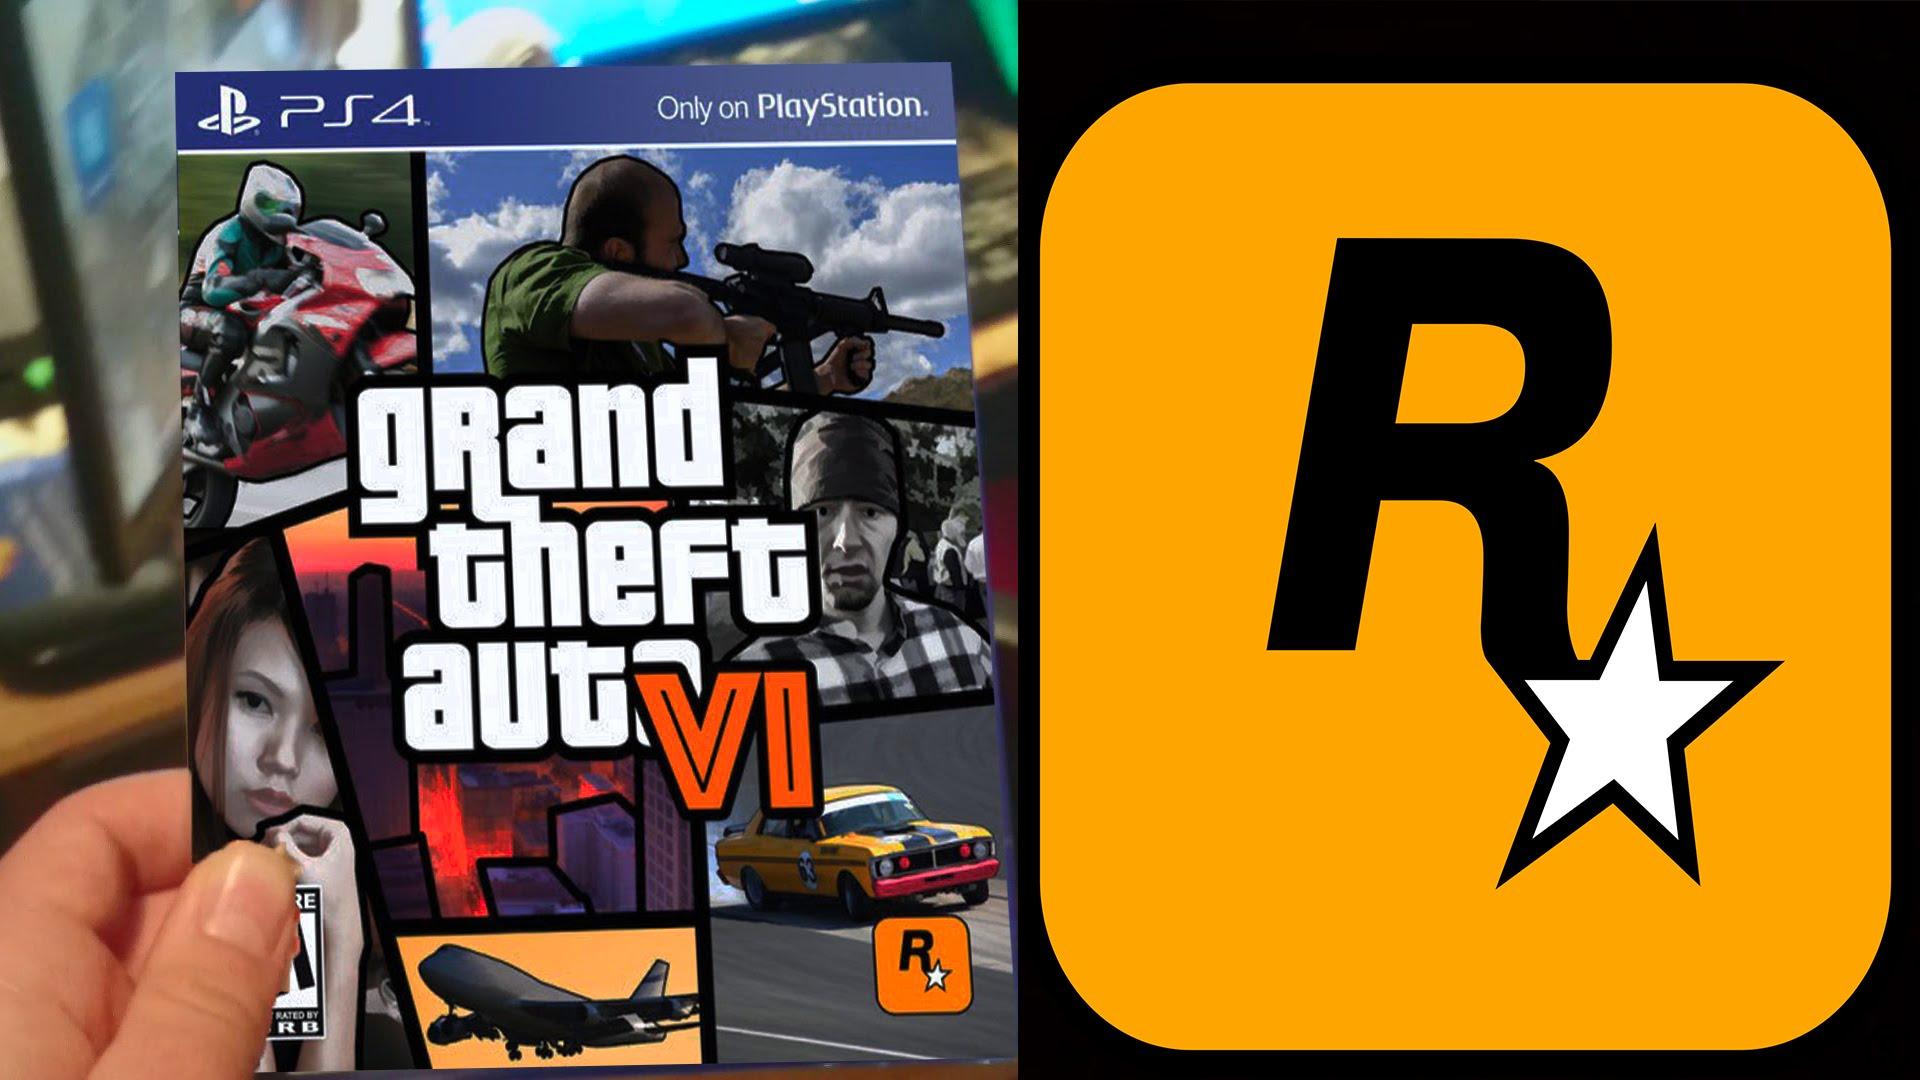 Rockstar Games wallpapers, Video Game, HQ Rockstar Games